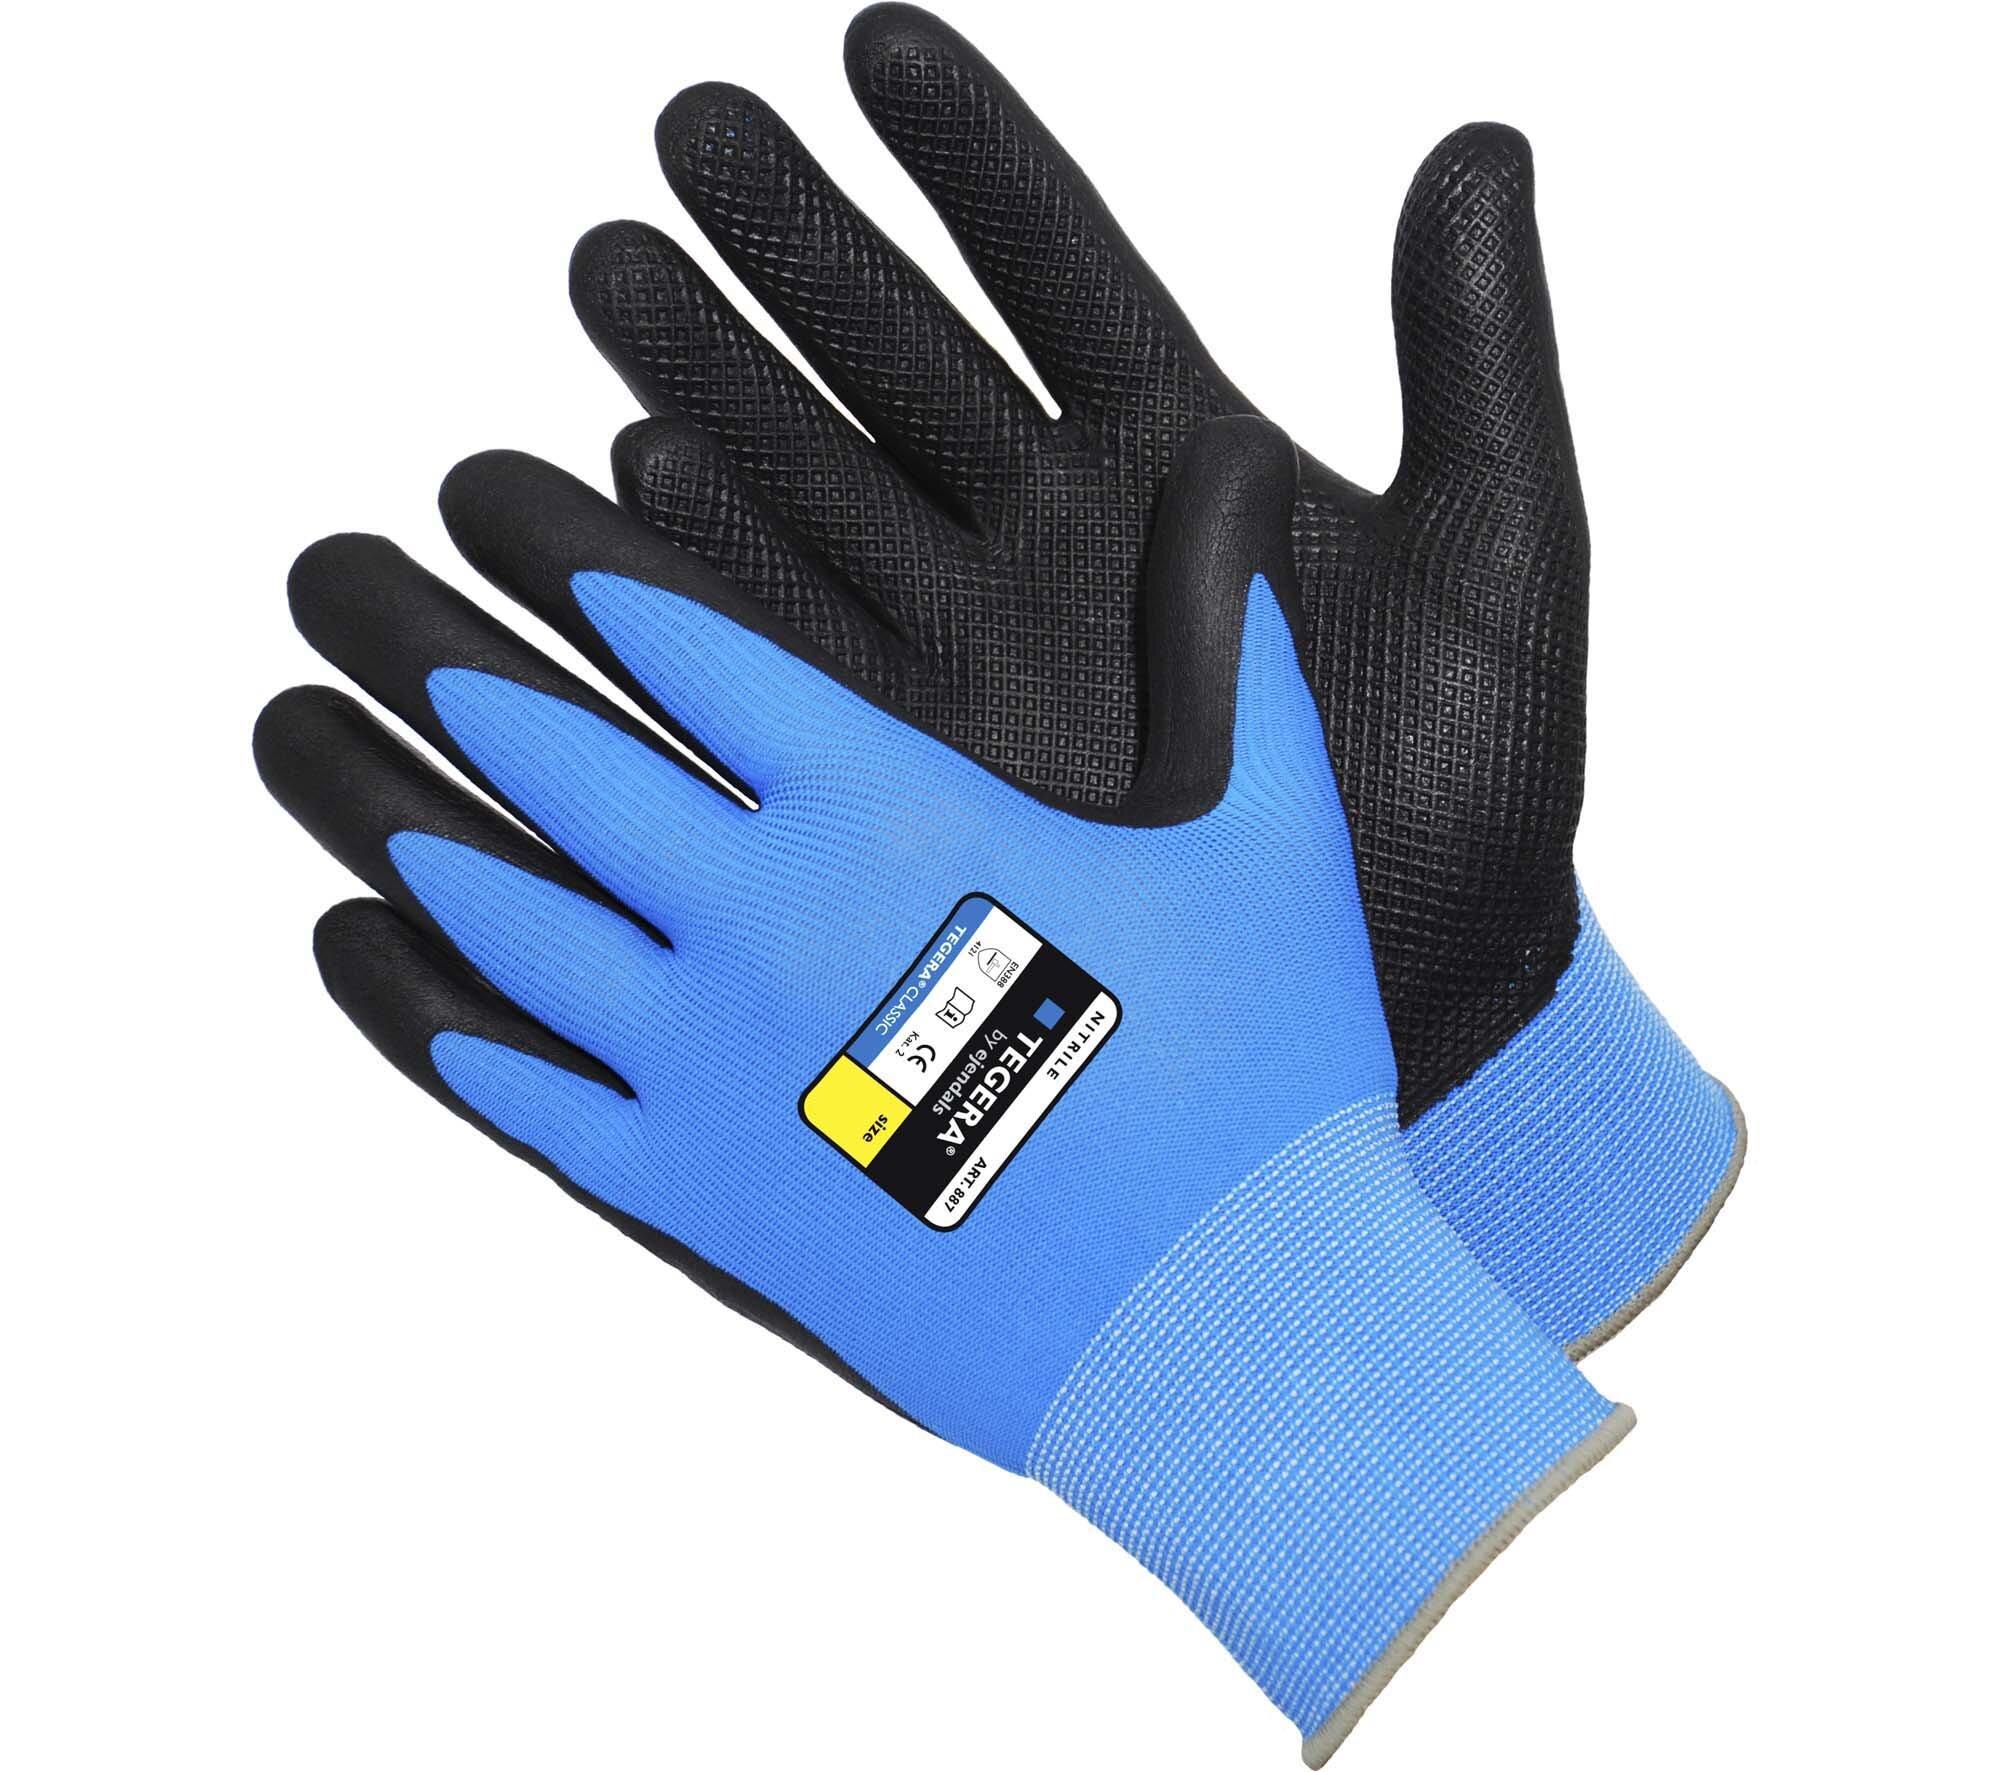 TEGERA 887 Nitrile Foam Coated Glove (Pair)